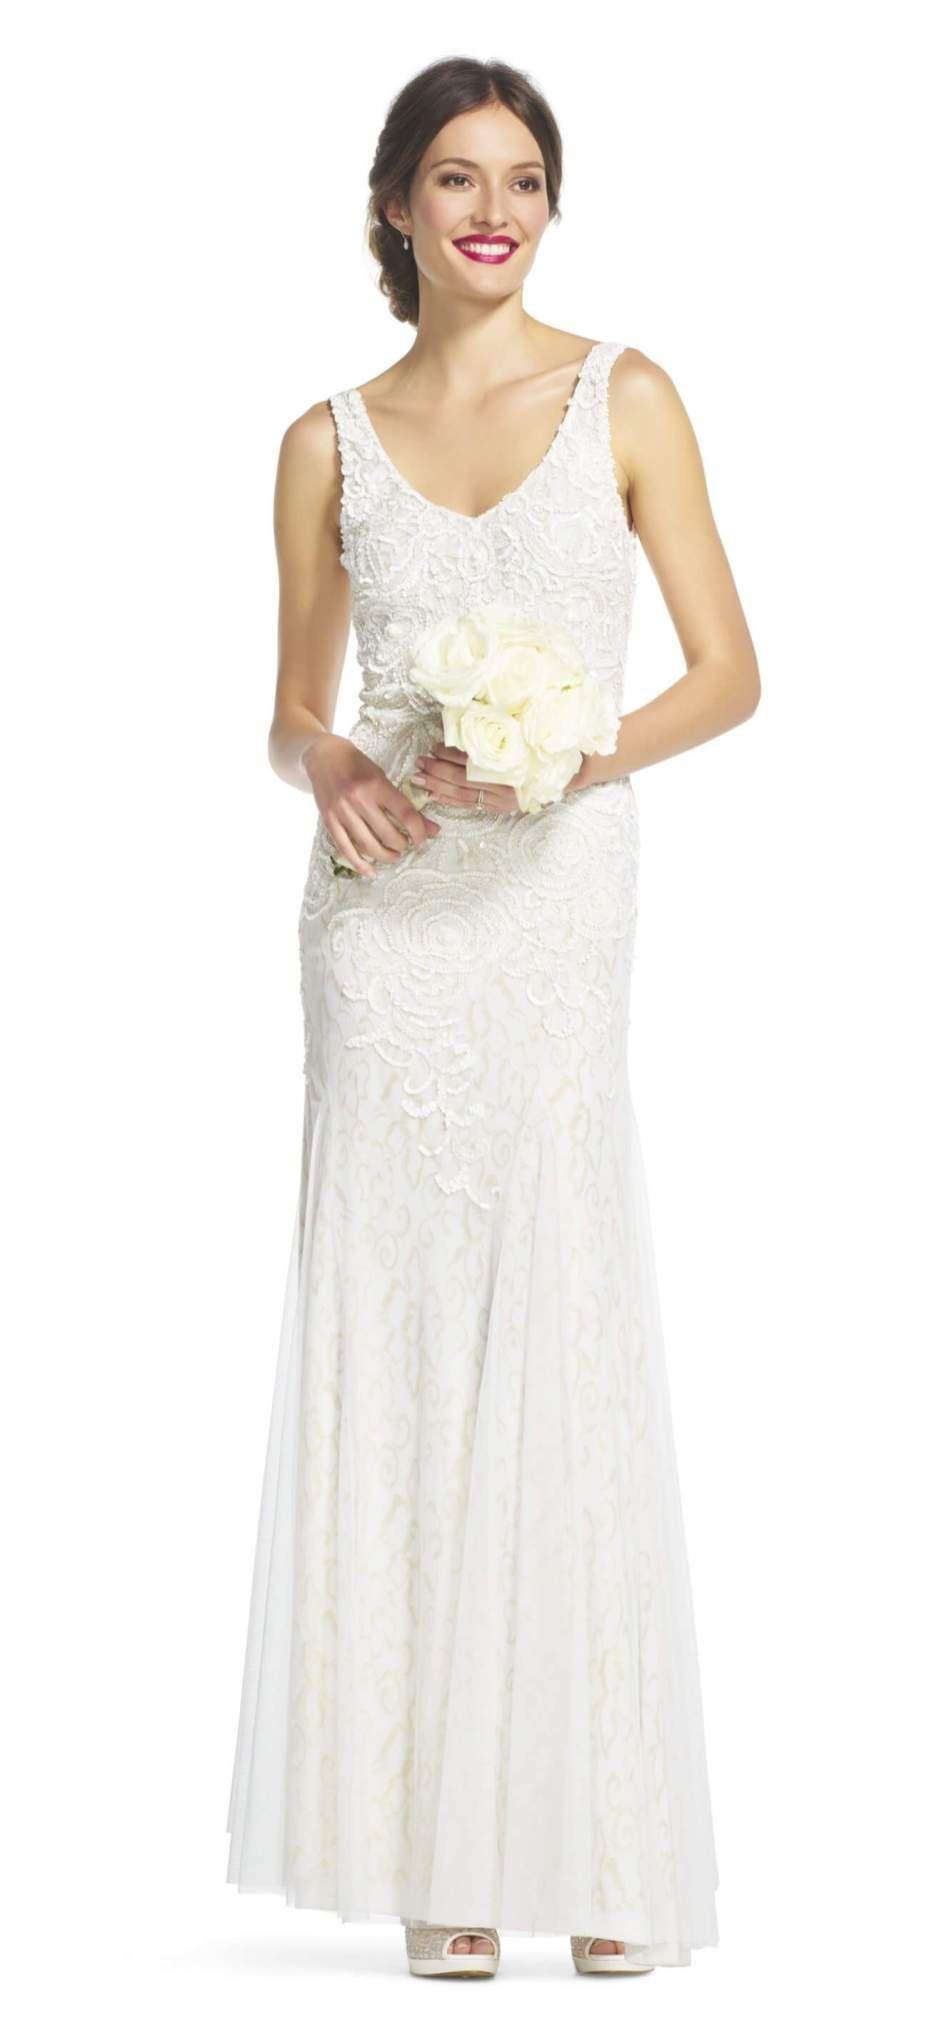 The Magic of Wedding Themes | White wedding dresses, Wedding dress ...